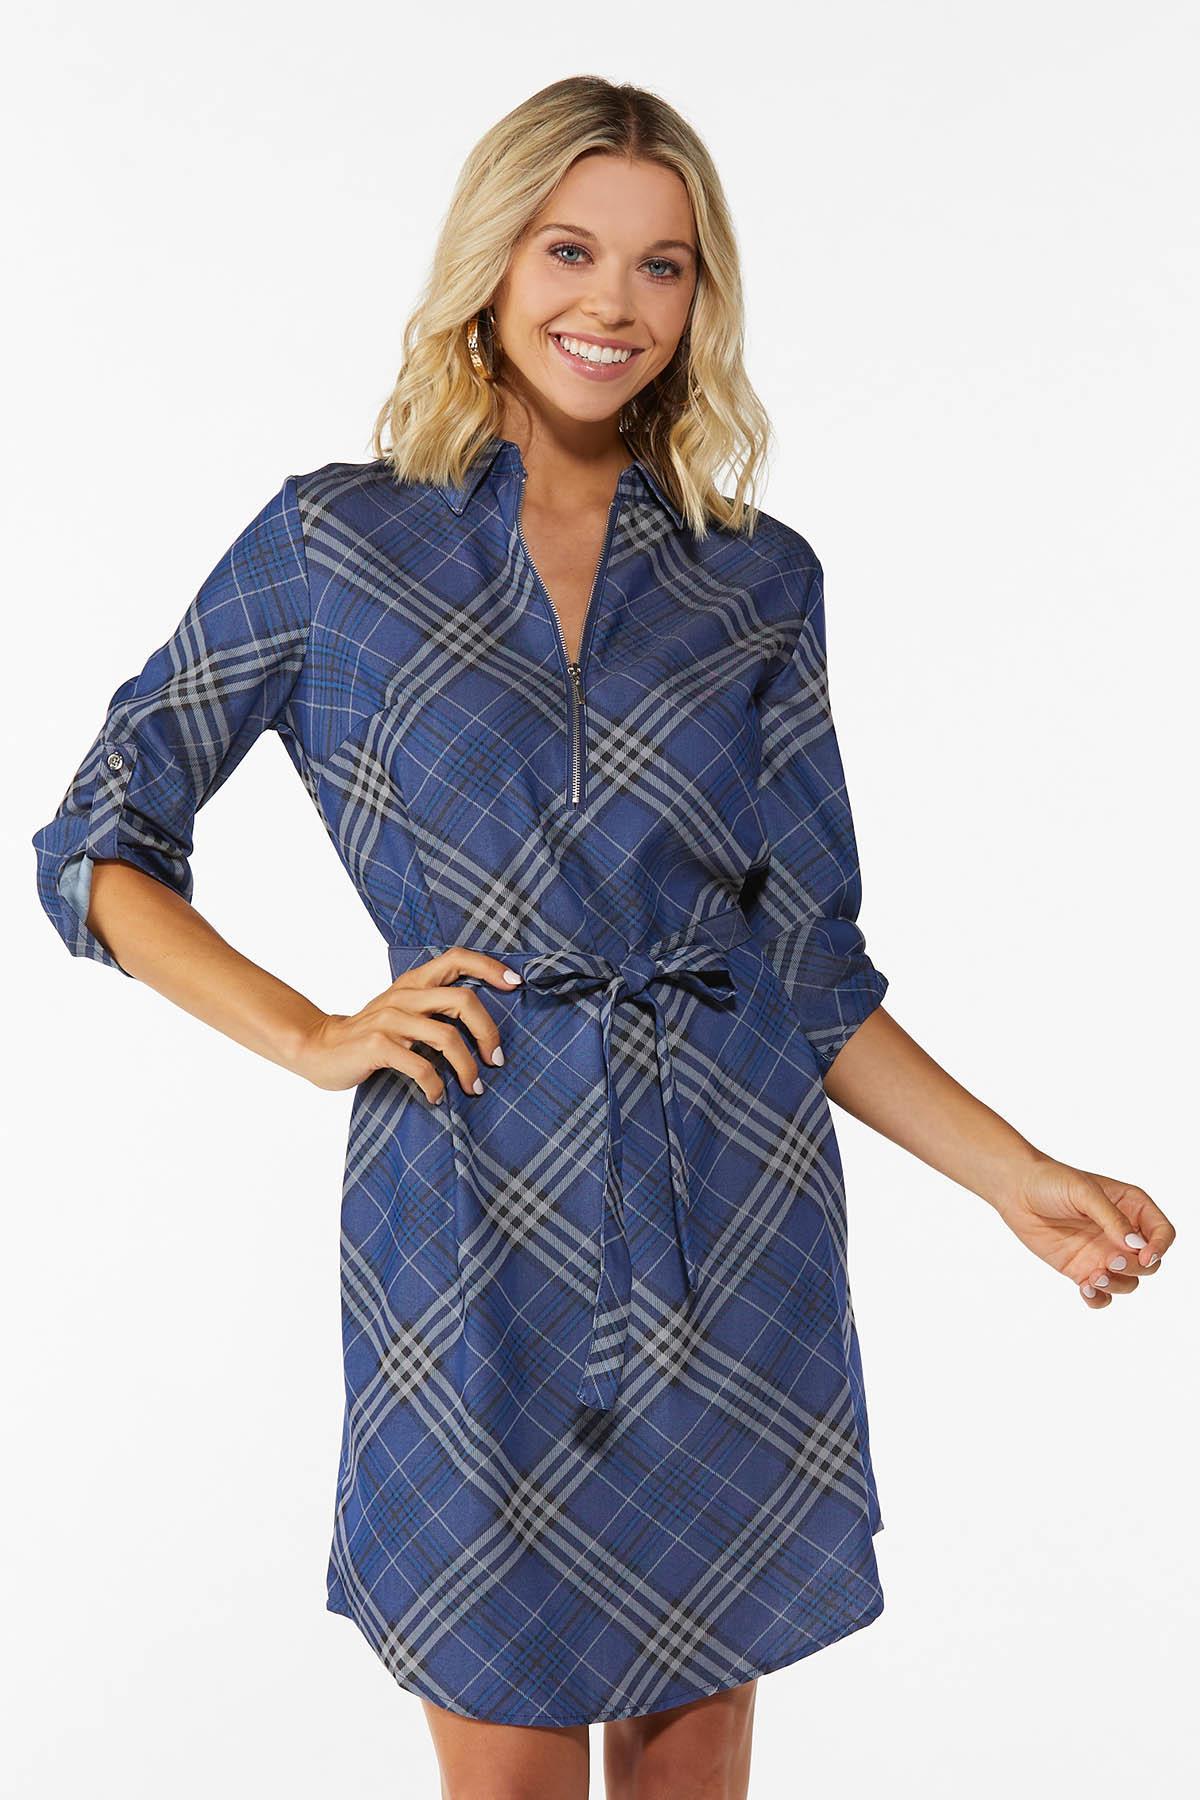 Blue Plaid Shirt Dress